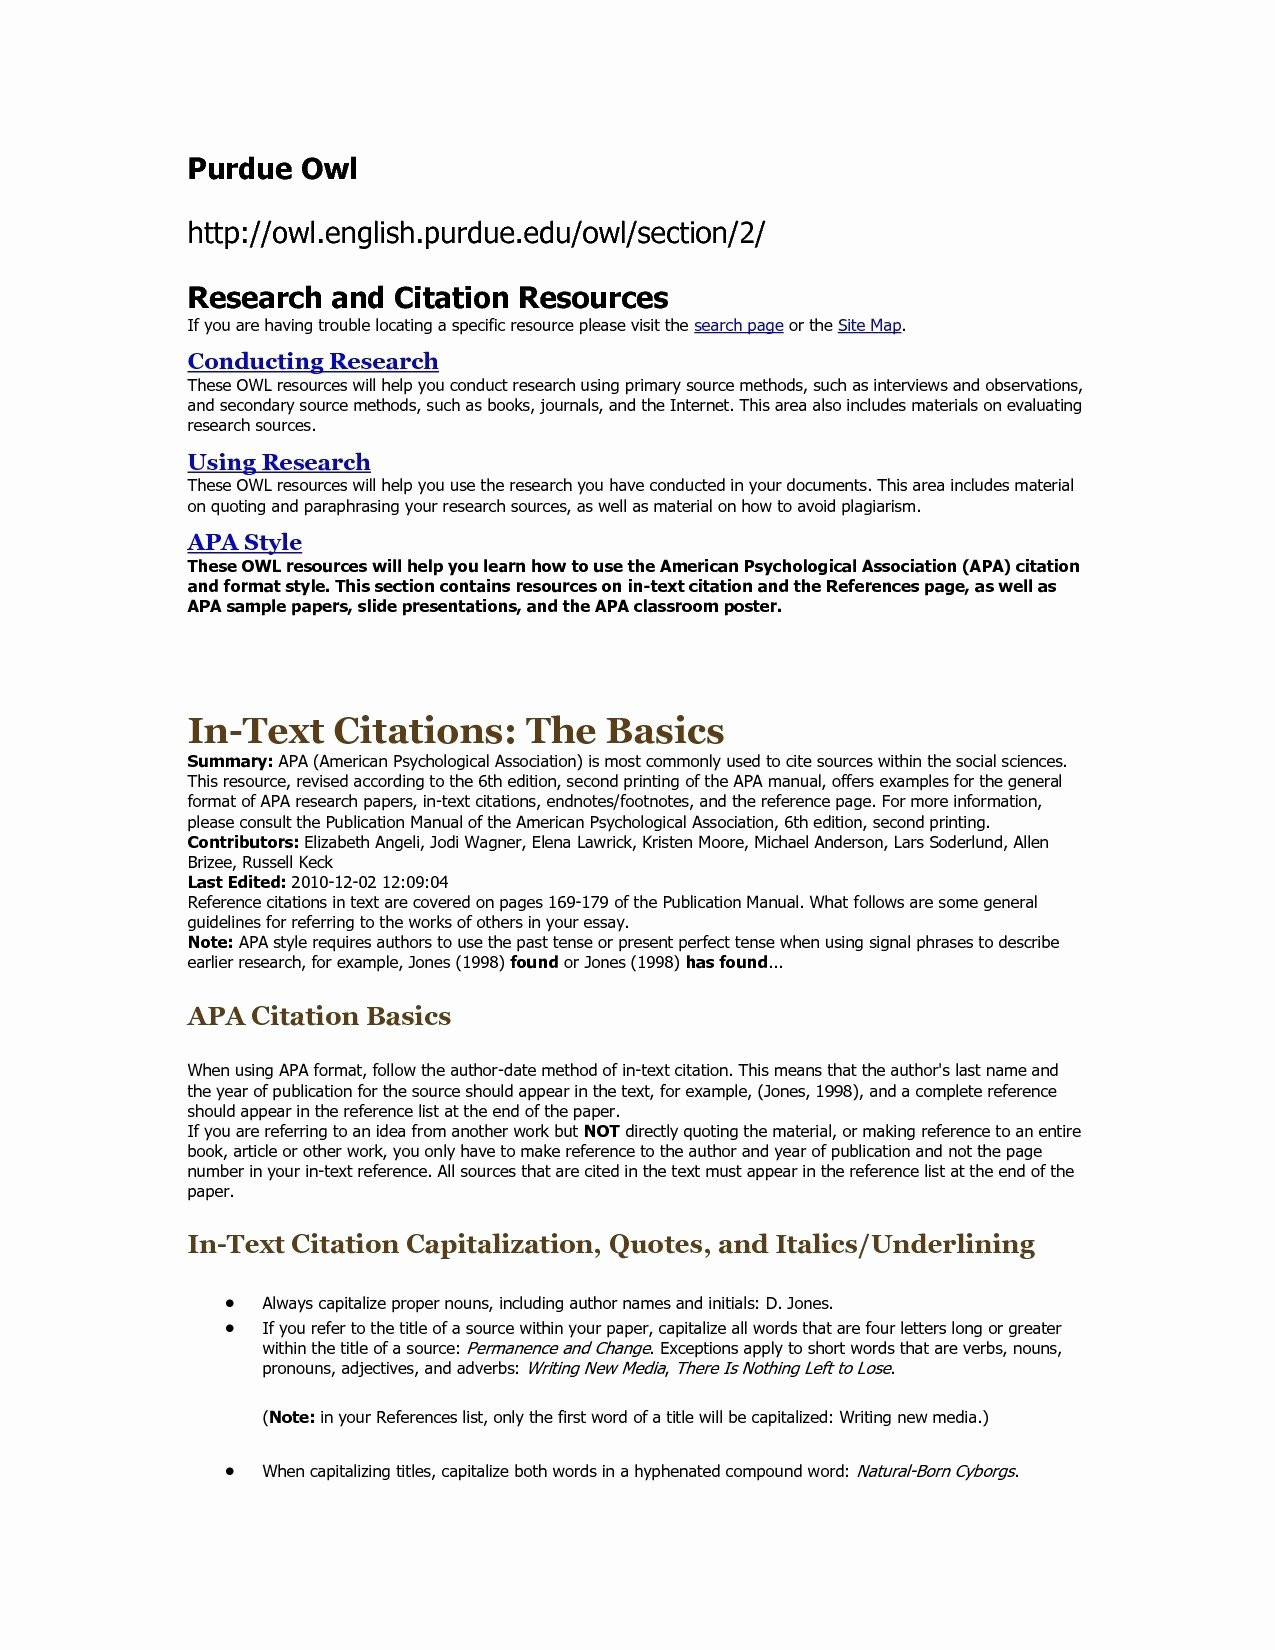 Purdue Owl Letter format Beautiful Best Business Letter Template Purdue Owl